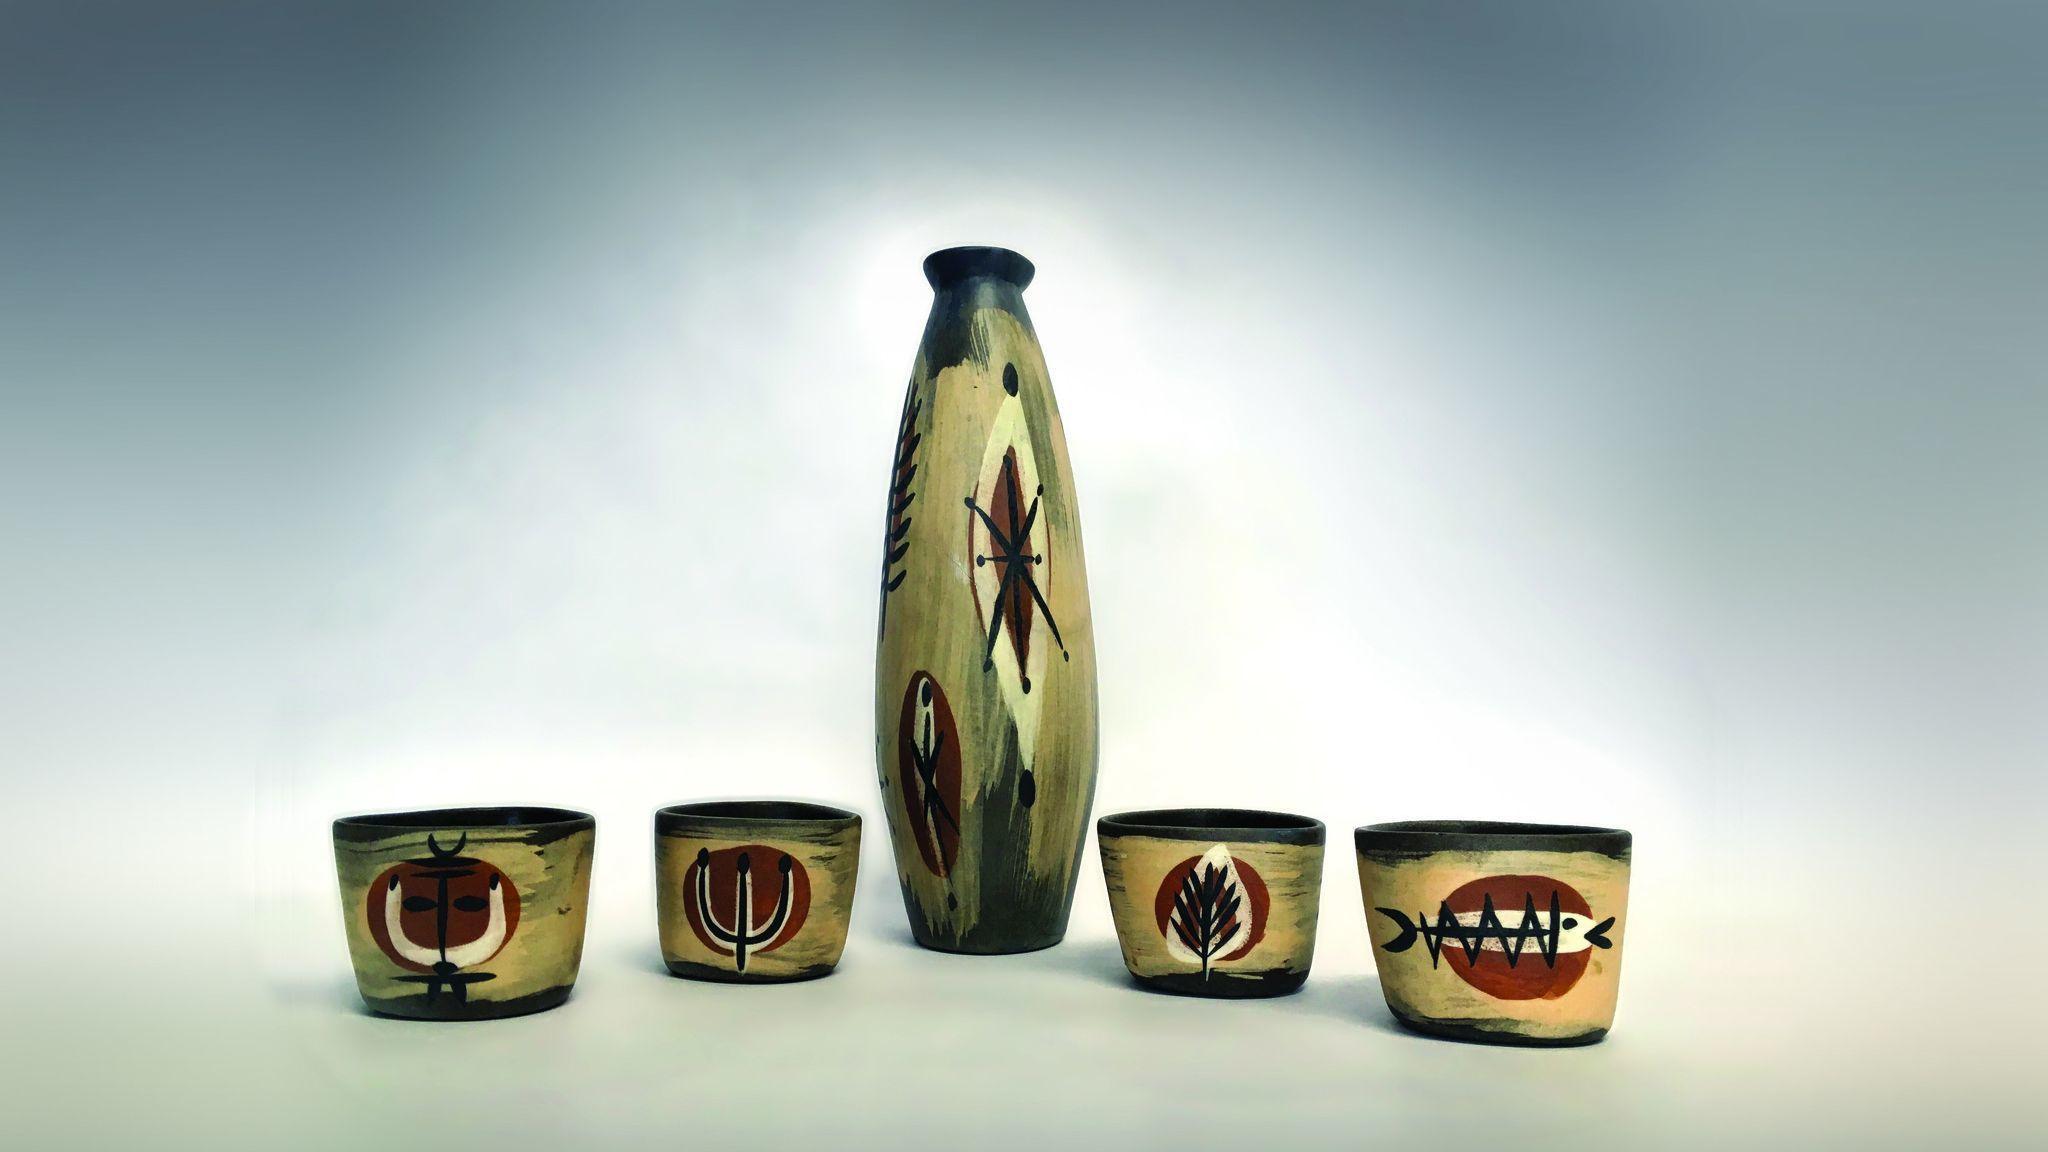 Richard Saar Ceramics